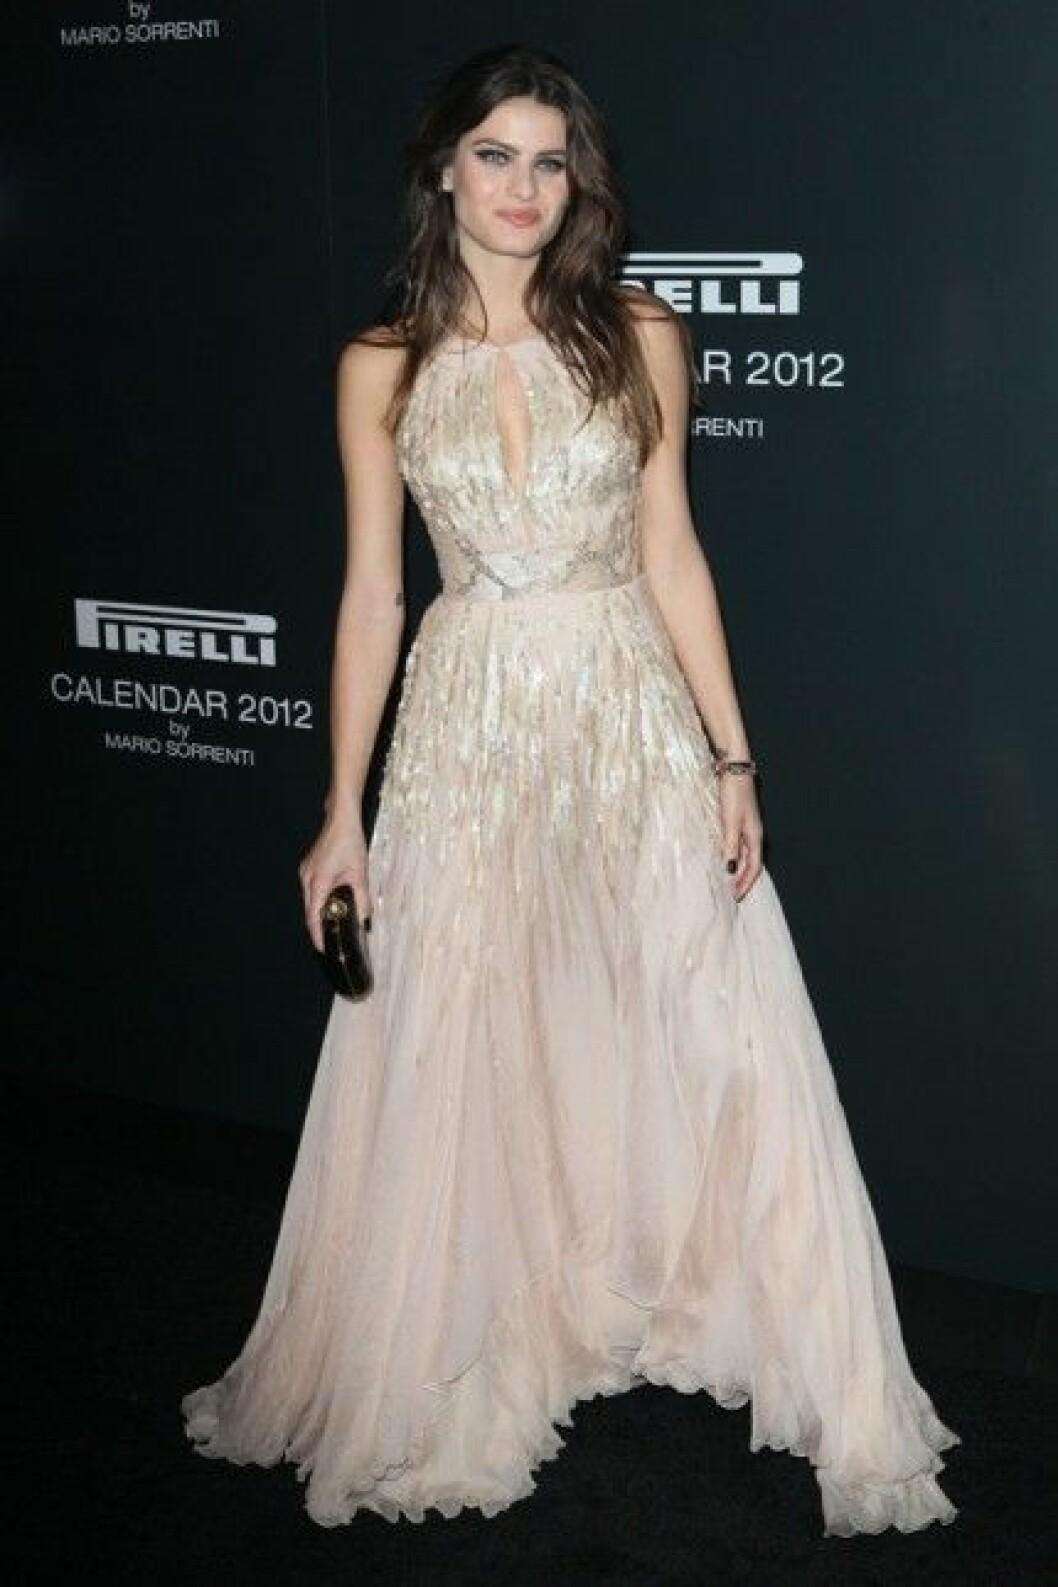 Isasbeli Fontana på The 2012 Pirelli Calendar gala dinner.